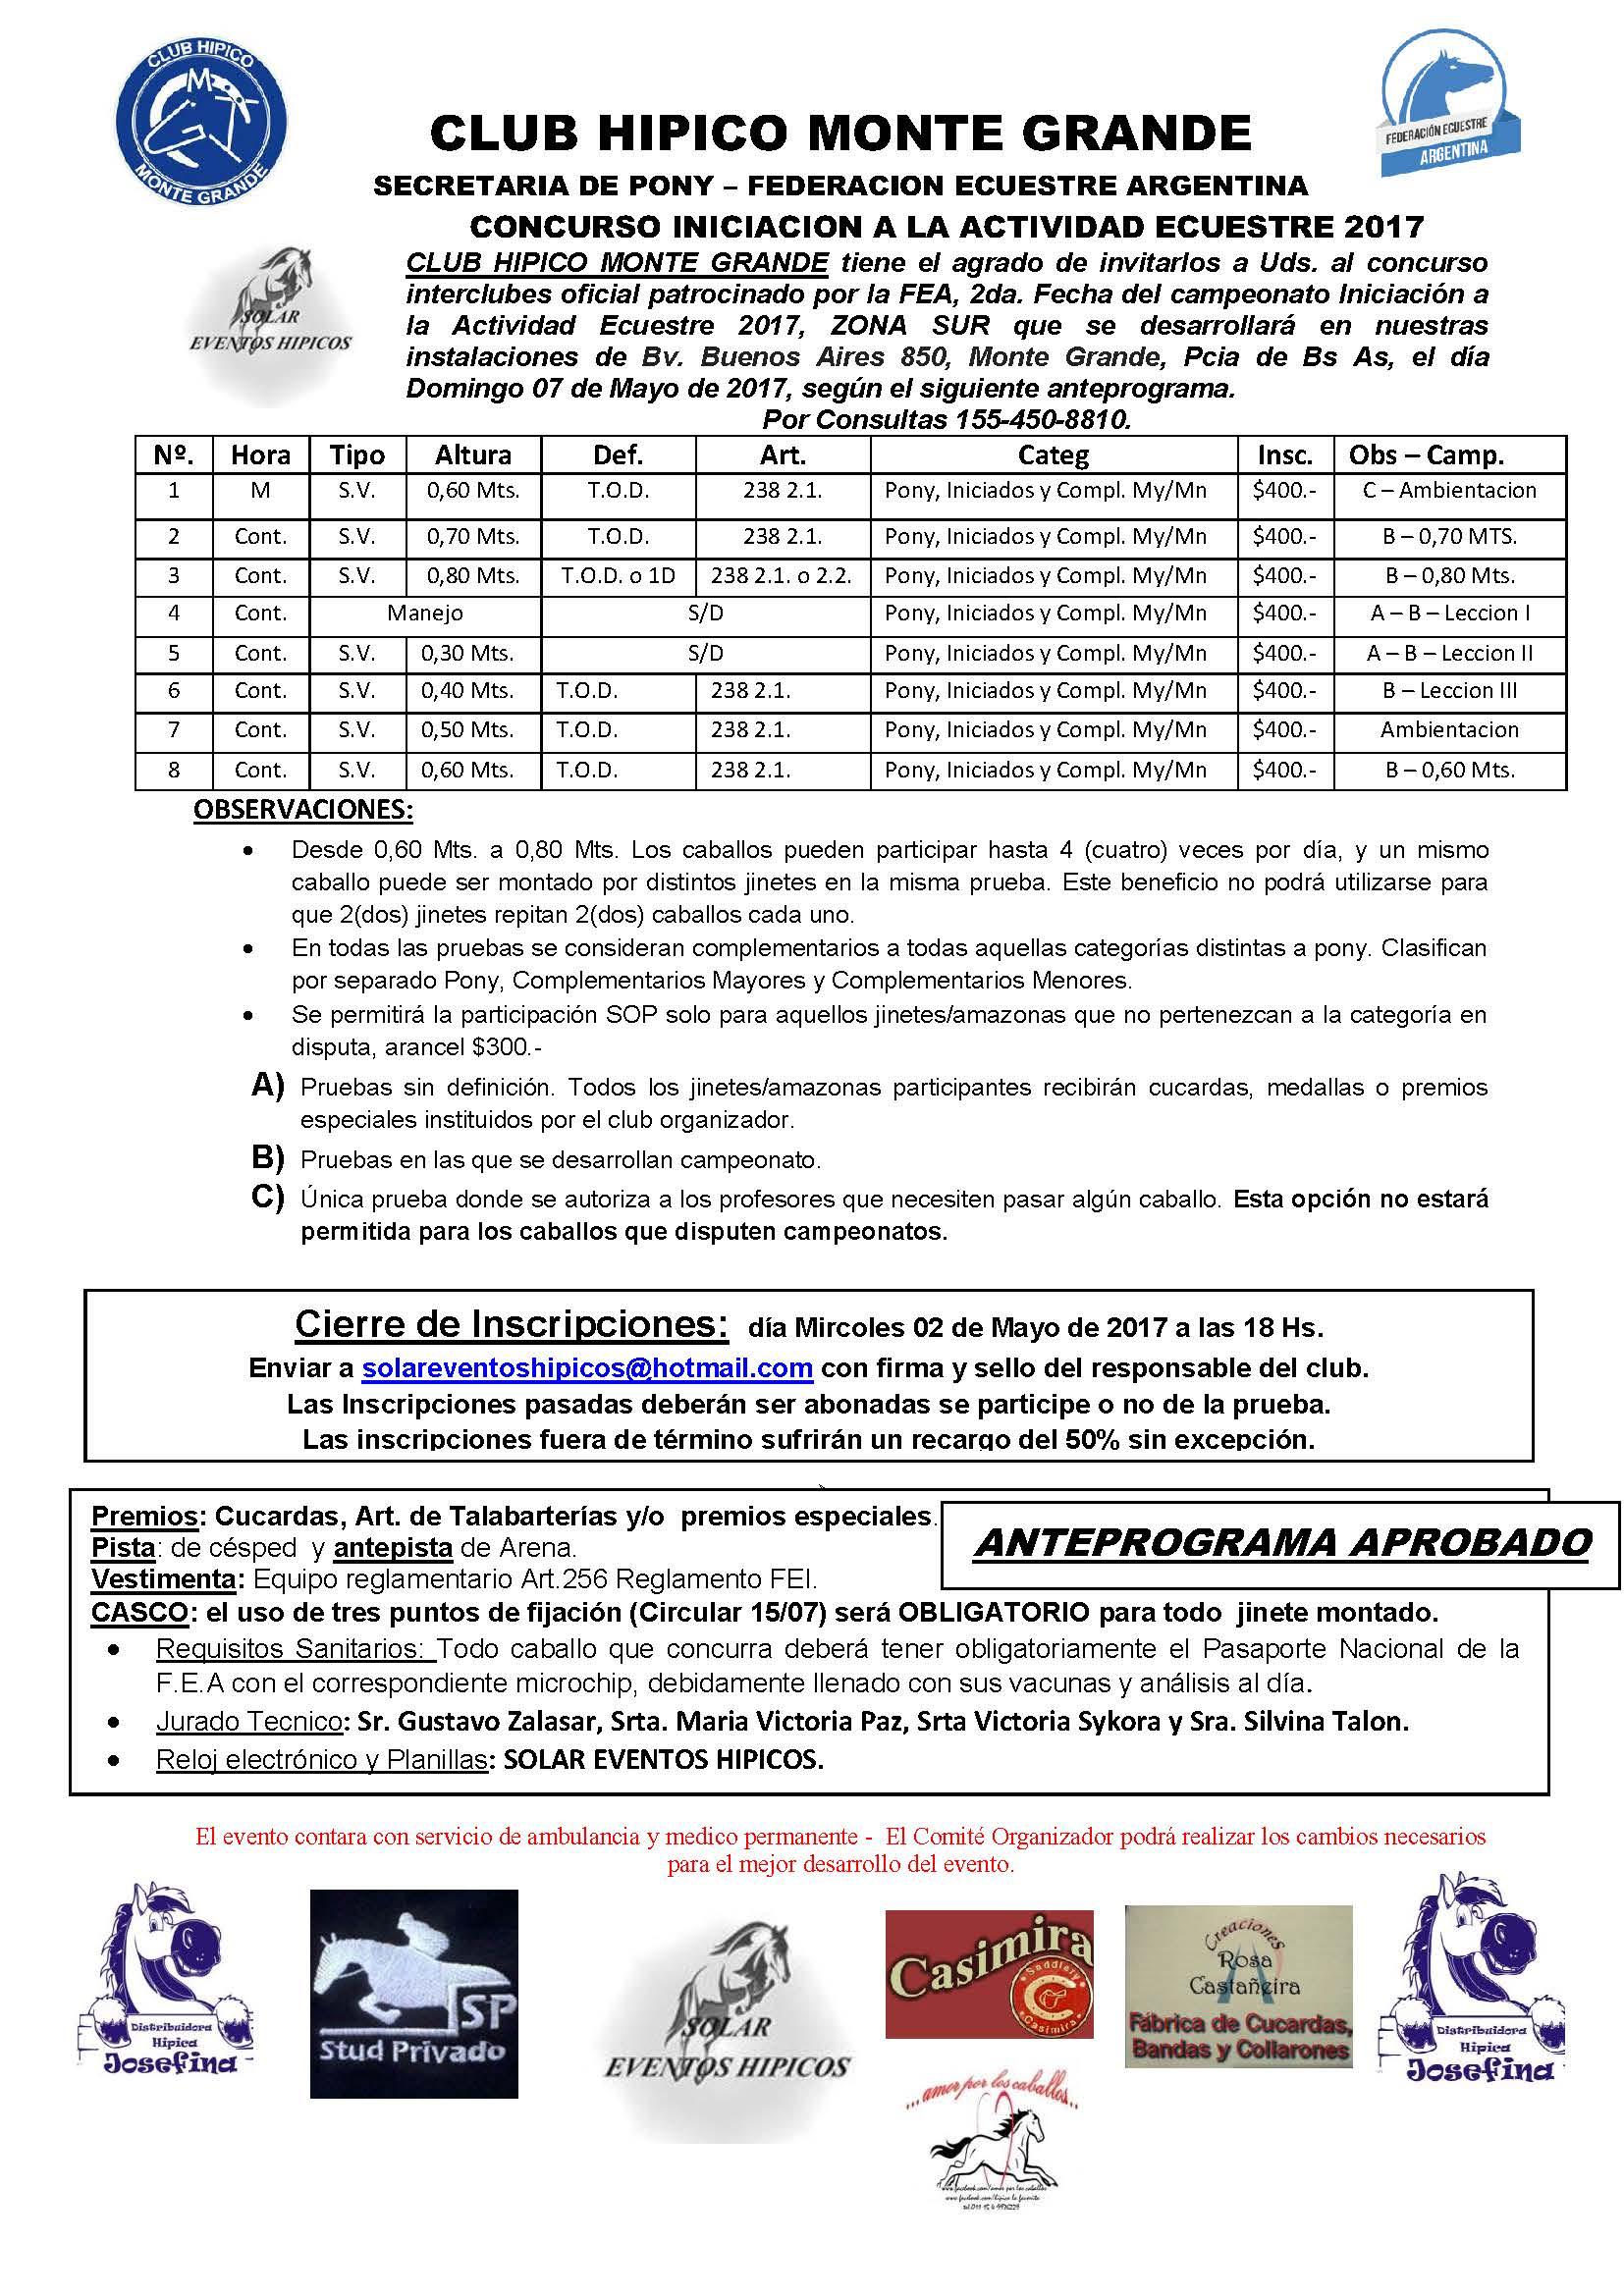 anteprograma-chmg-07-05-2017 Web